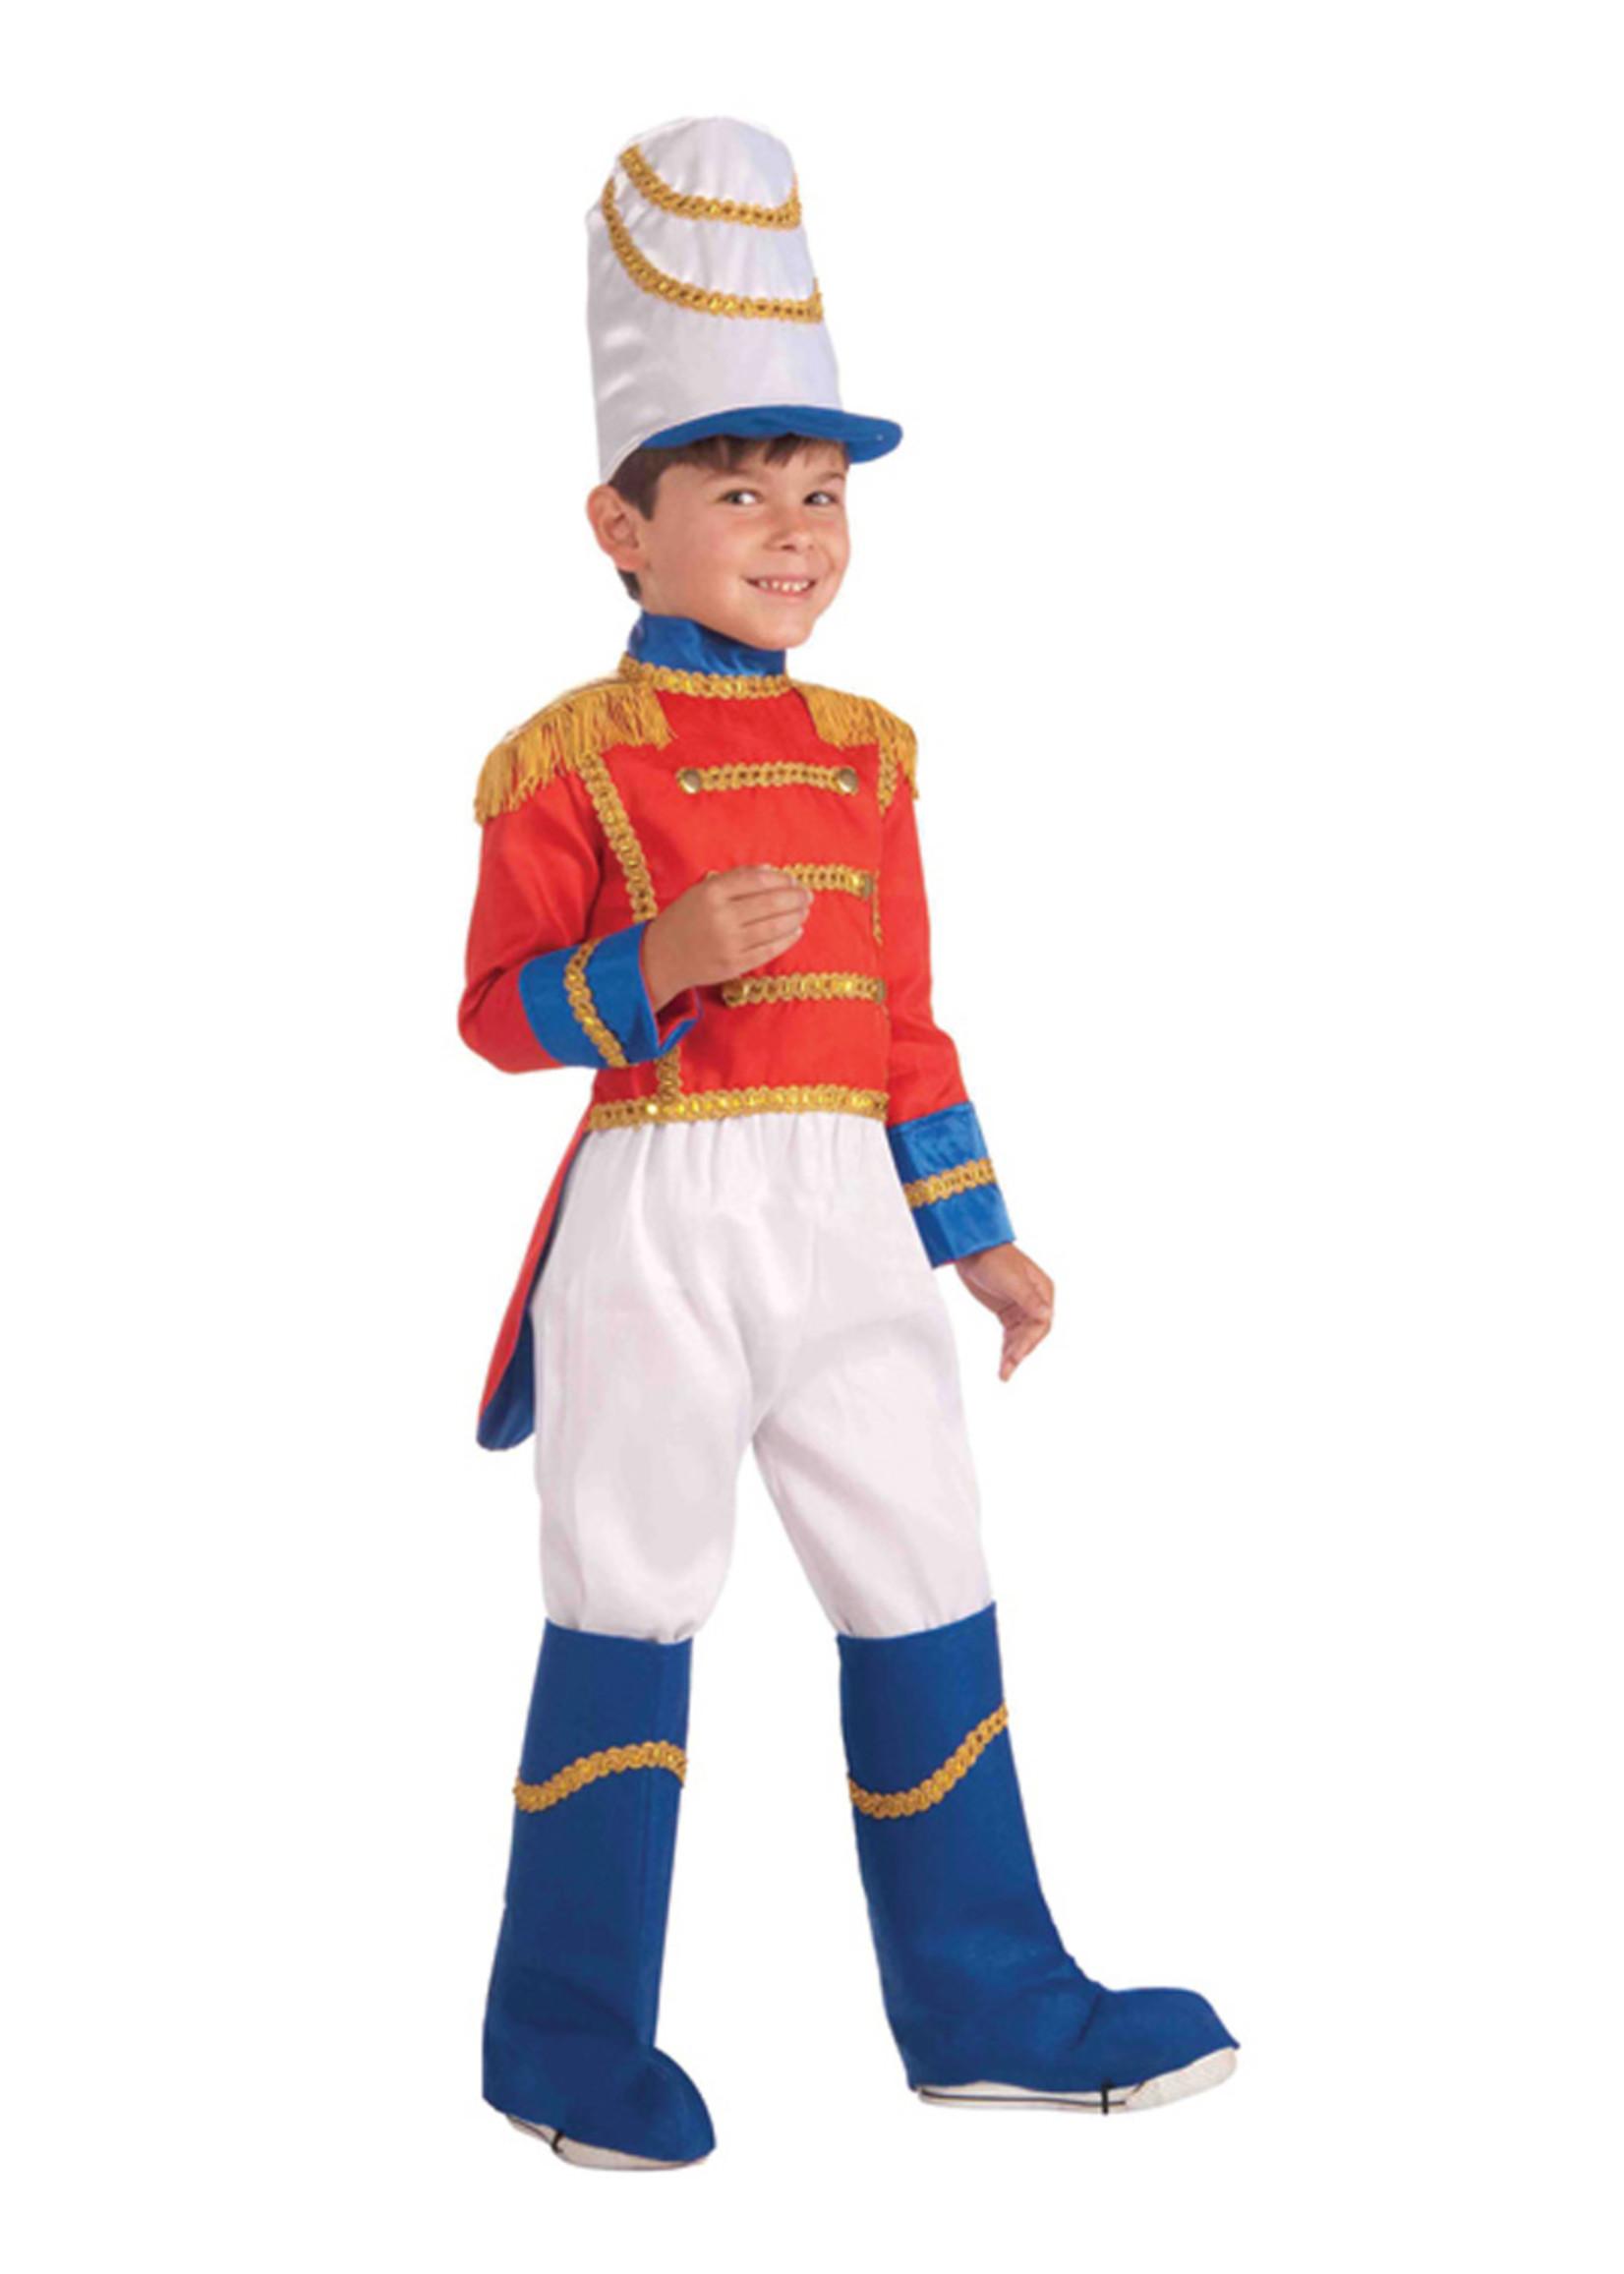 FORUM NOVELTIES Toy Soldier Costume - Boy's